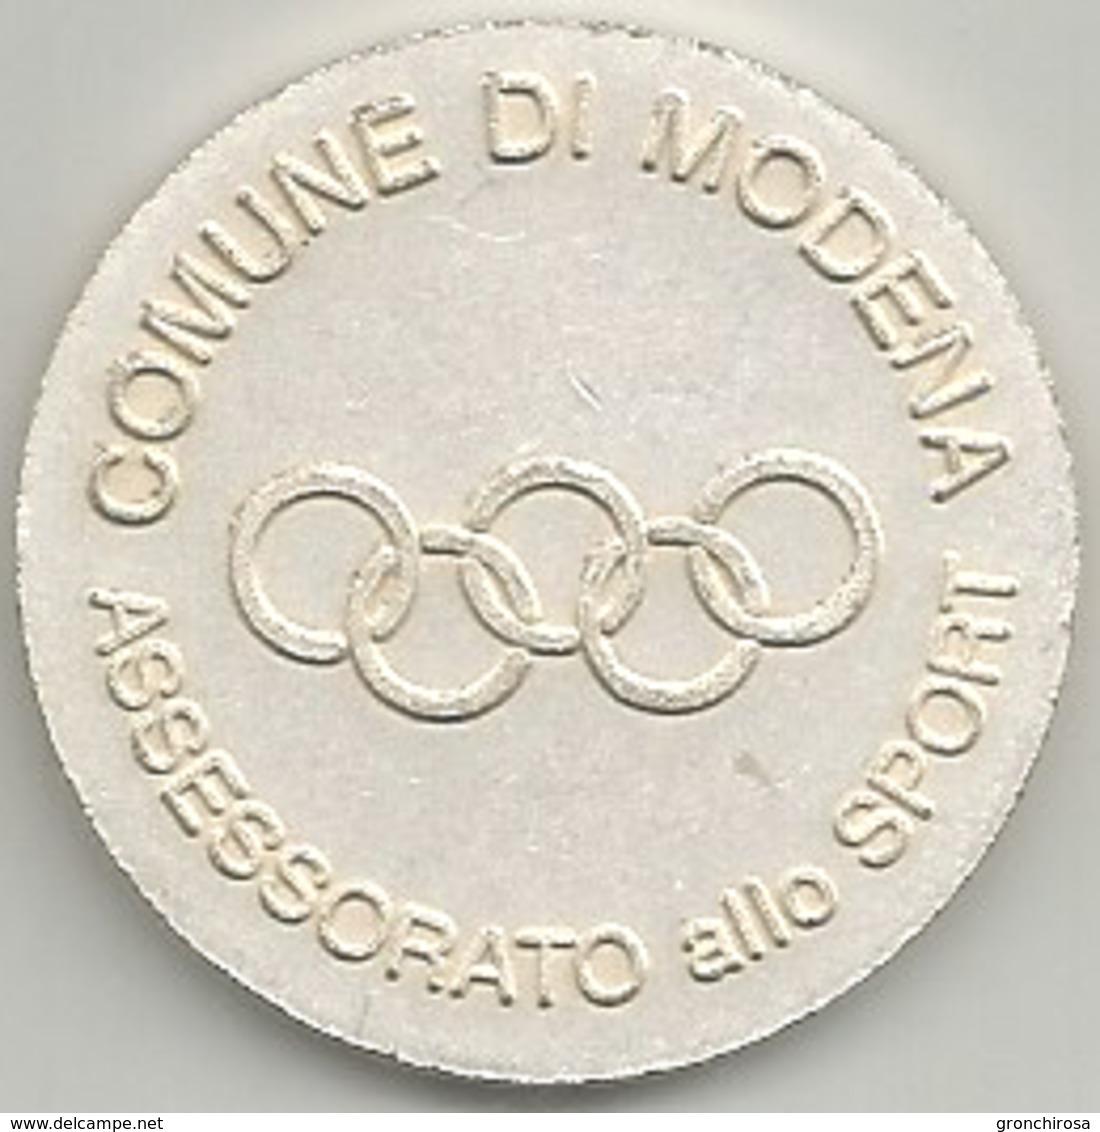 Modena Comune, Assessorato Allo Sport, Mist. Dorata E Smaltata Gr. 12, Cm. 3,2. - Italia